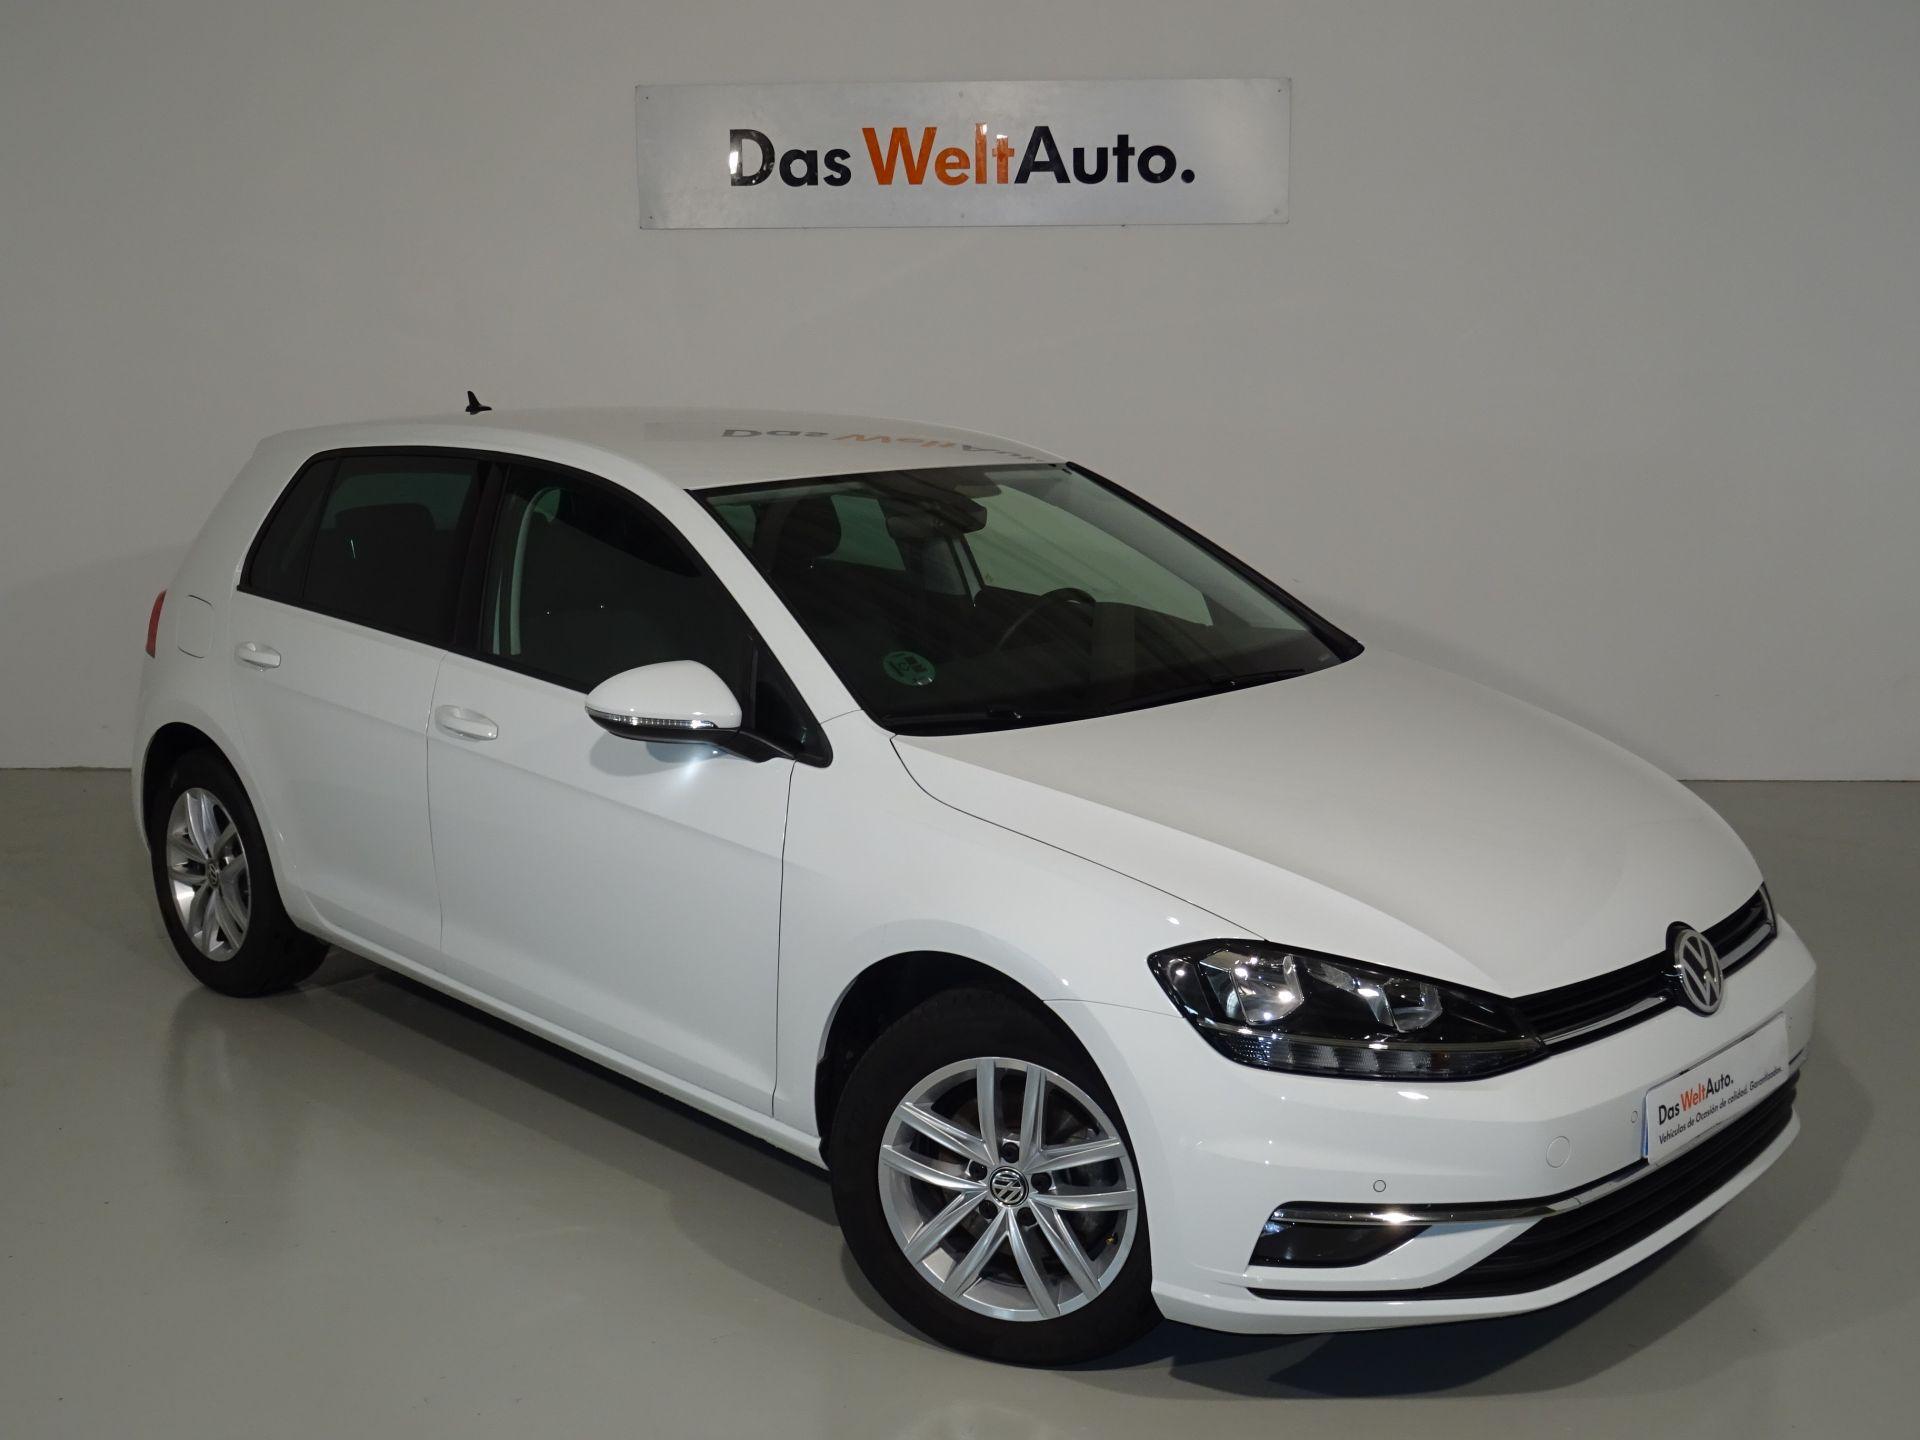 Volkswagen Golf Advance 1.6 TDI 85kW (115CV)